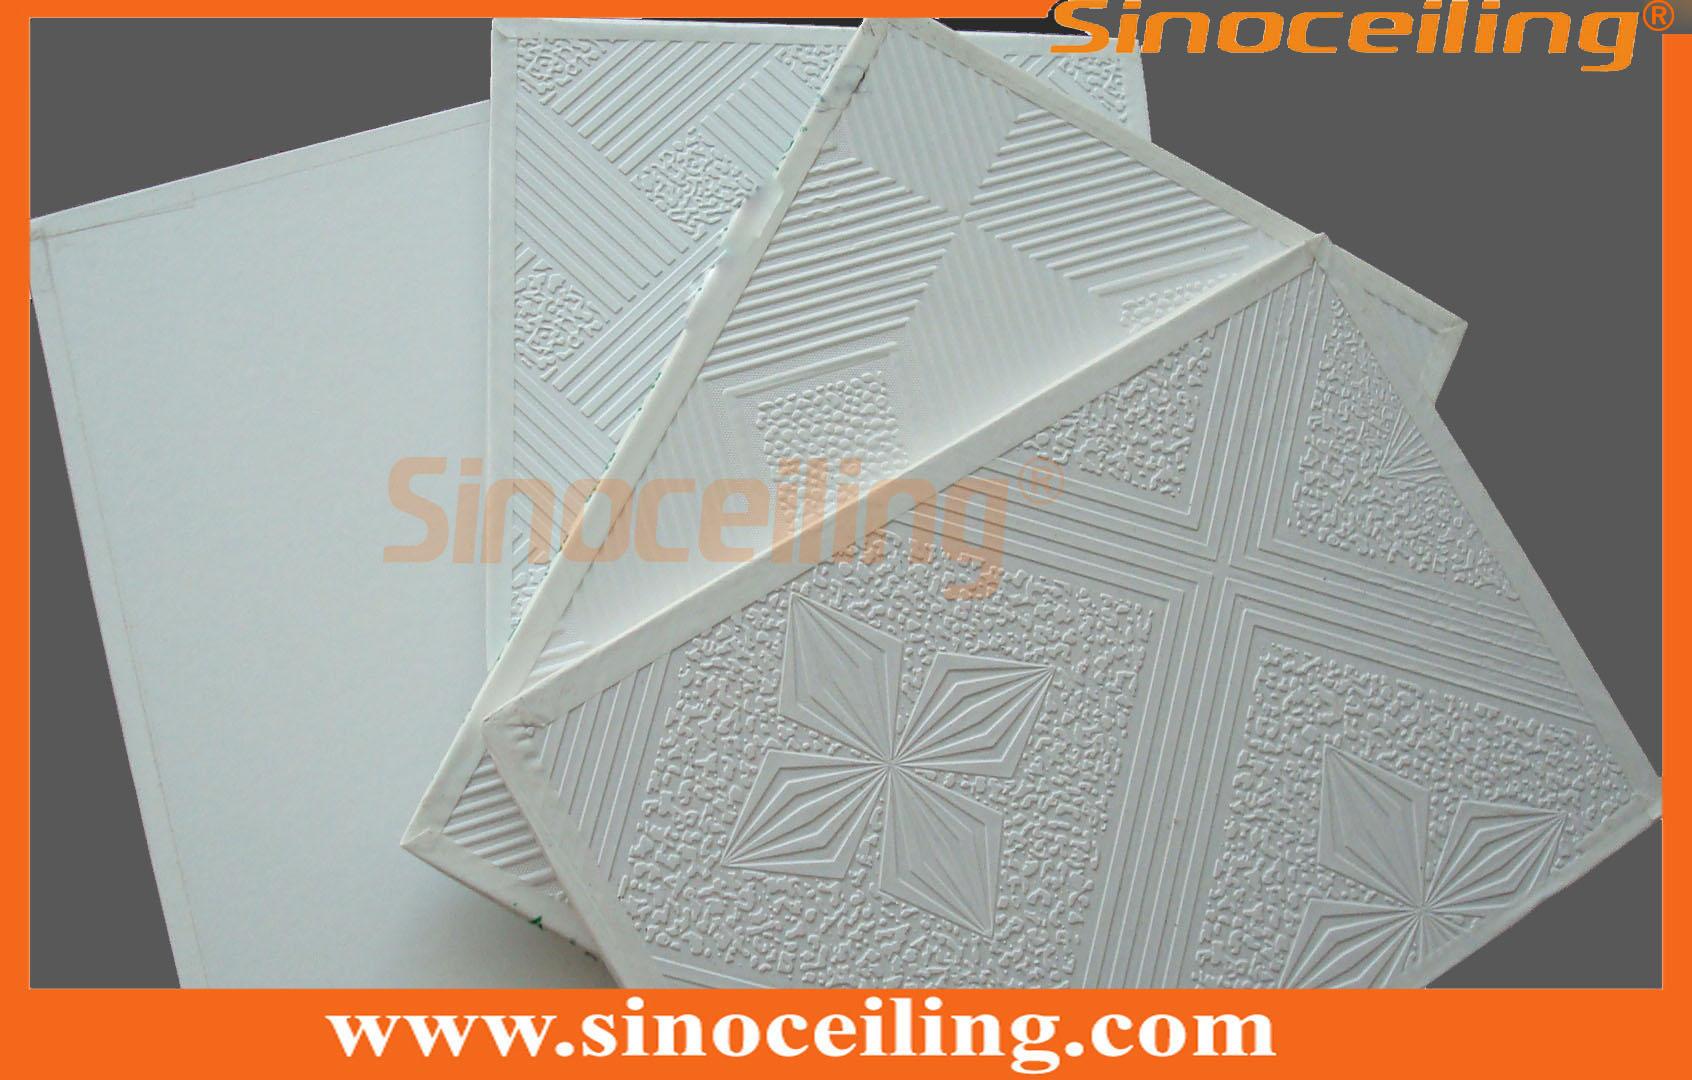 Manufacturing of ceiling suspension tiles tee grids metal pvc gypsum ceiling tile doublecrazyfo Choice Image